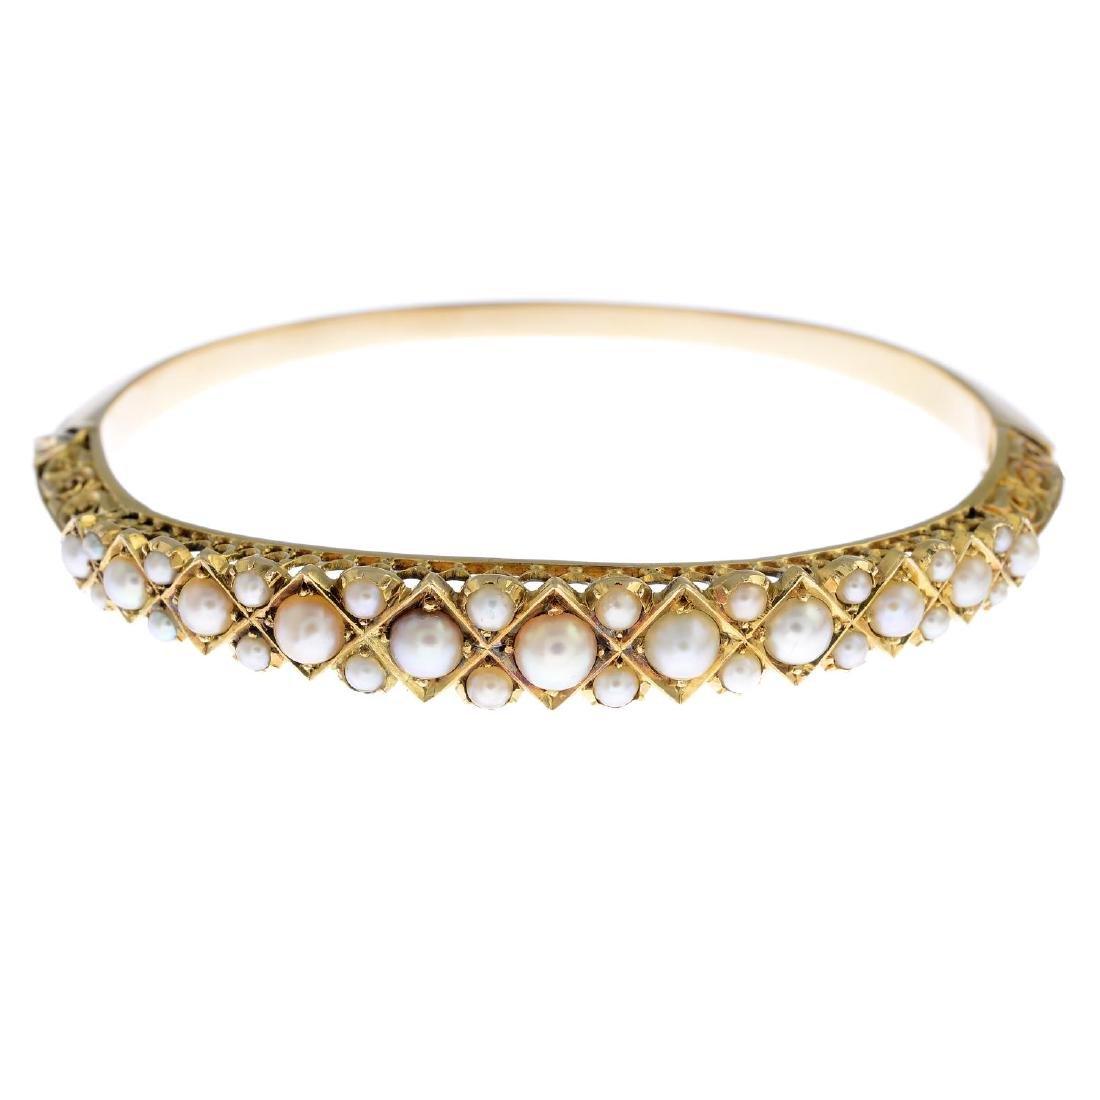 A split pearl hinged bangle. The graduated split pearl